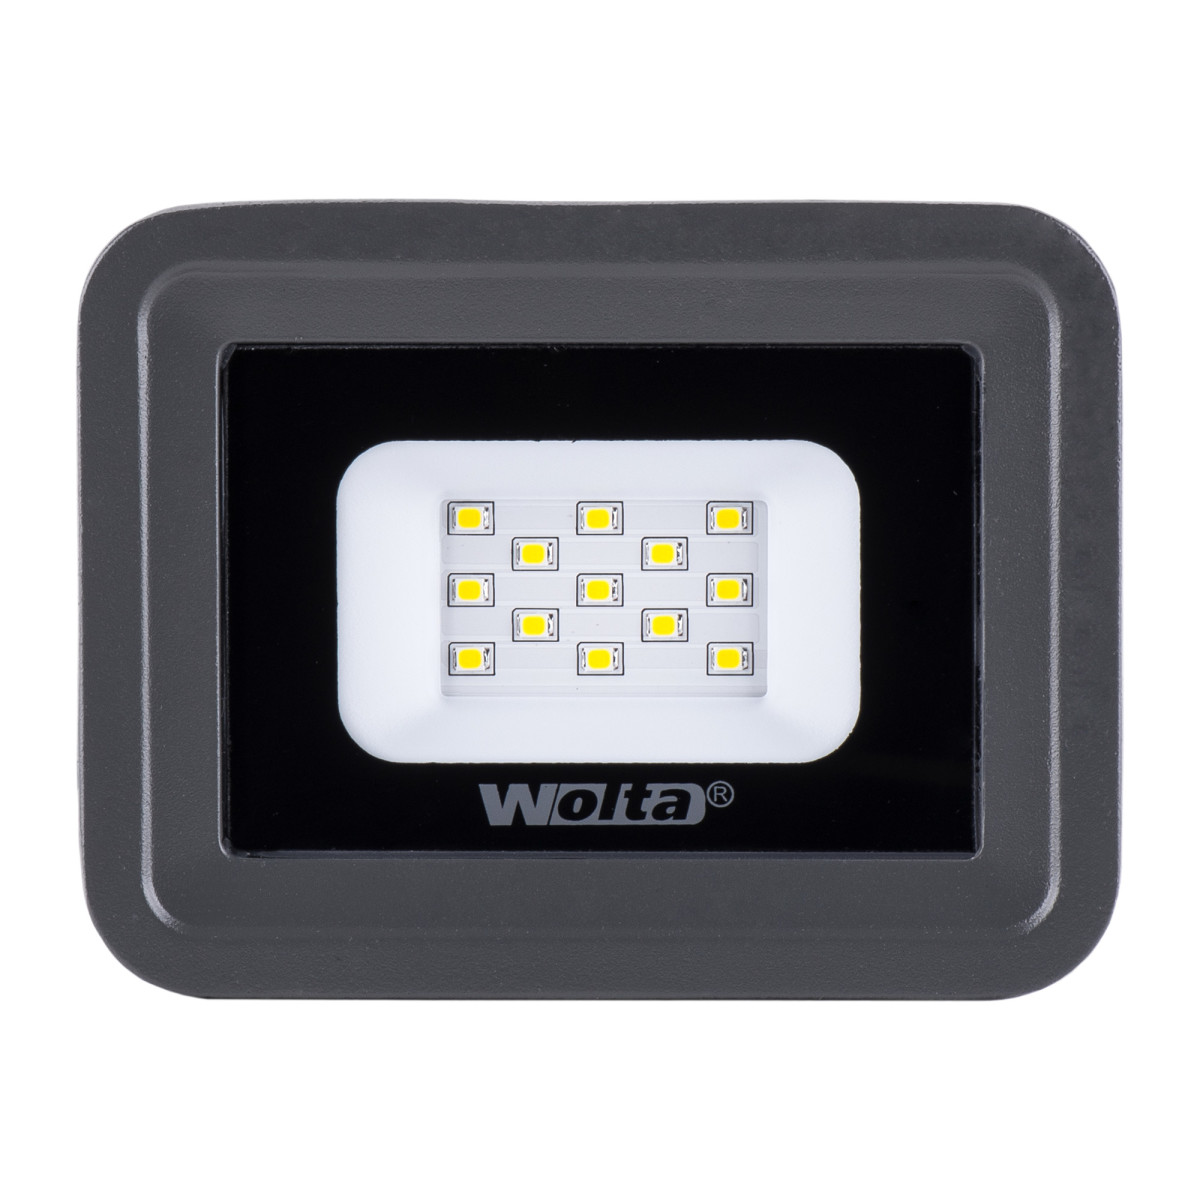 Прожектор Wolta 10 Вт 850 Лм 5500 K IP65